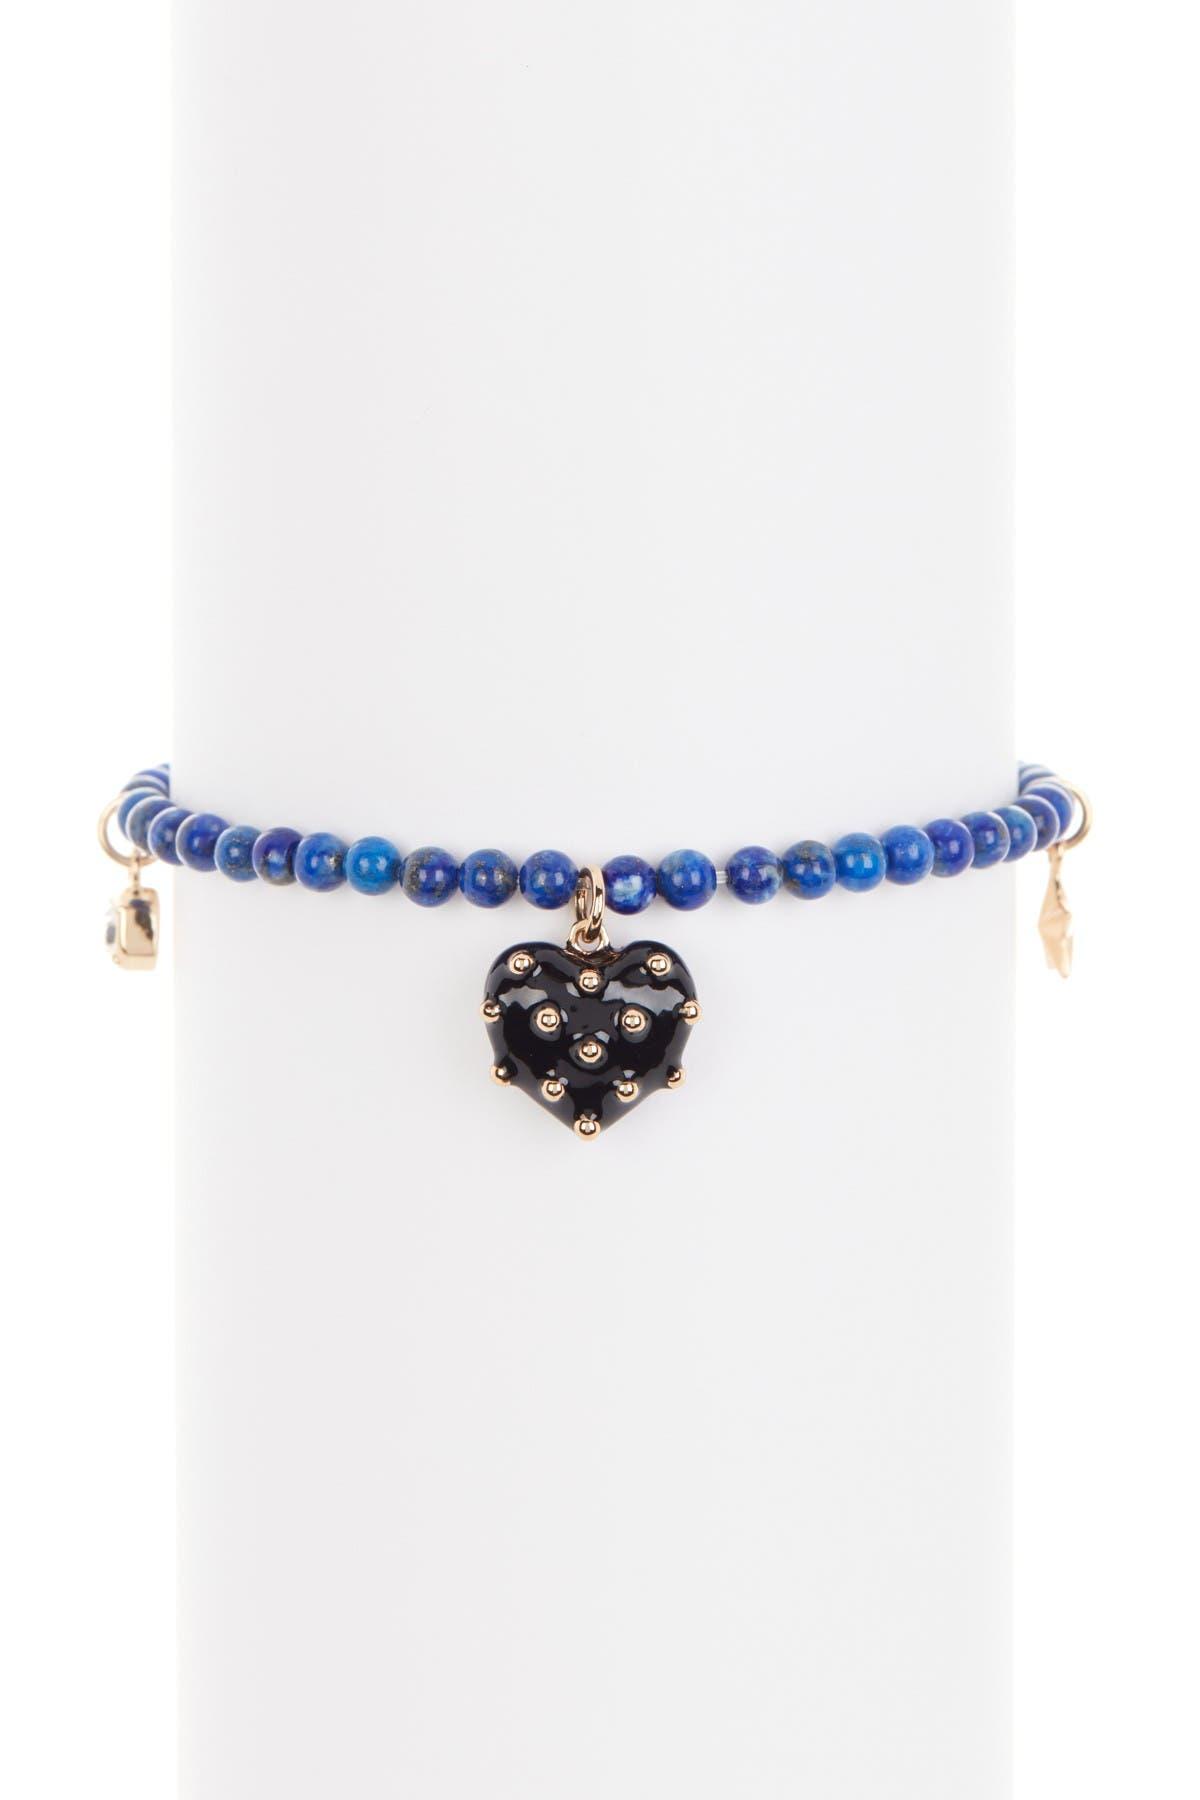 Image of Rebecca Minkoff Studded Heart Charm Stone Bead Stretch Bracelet